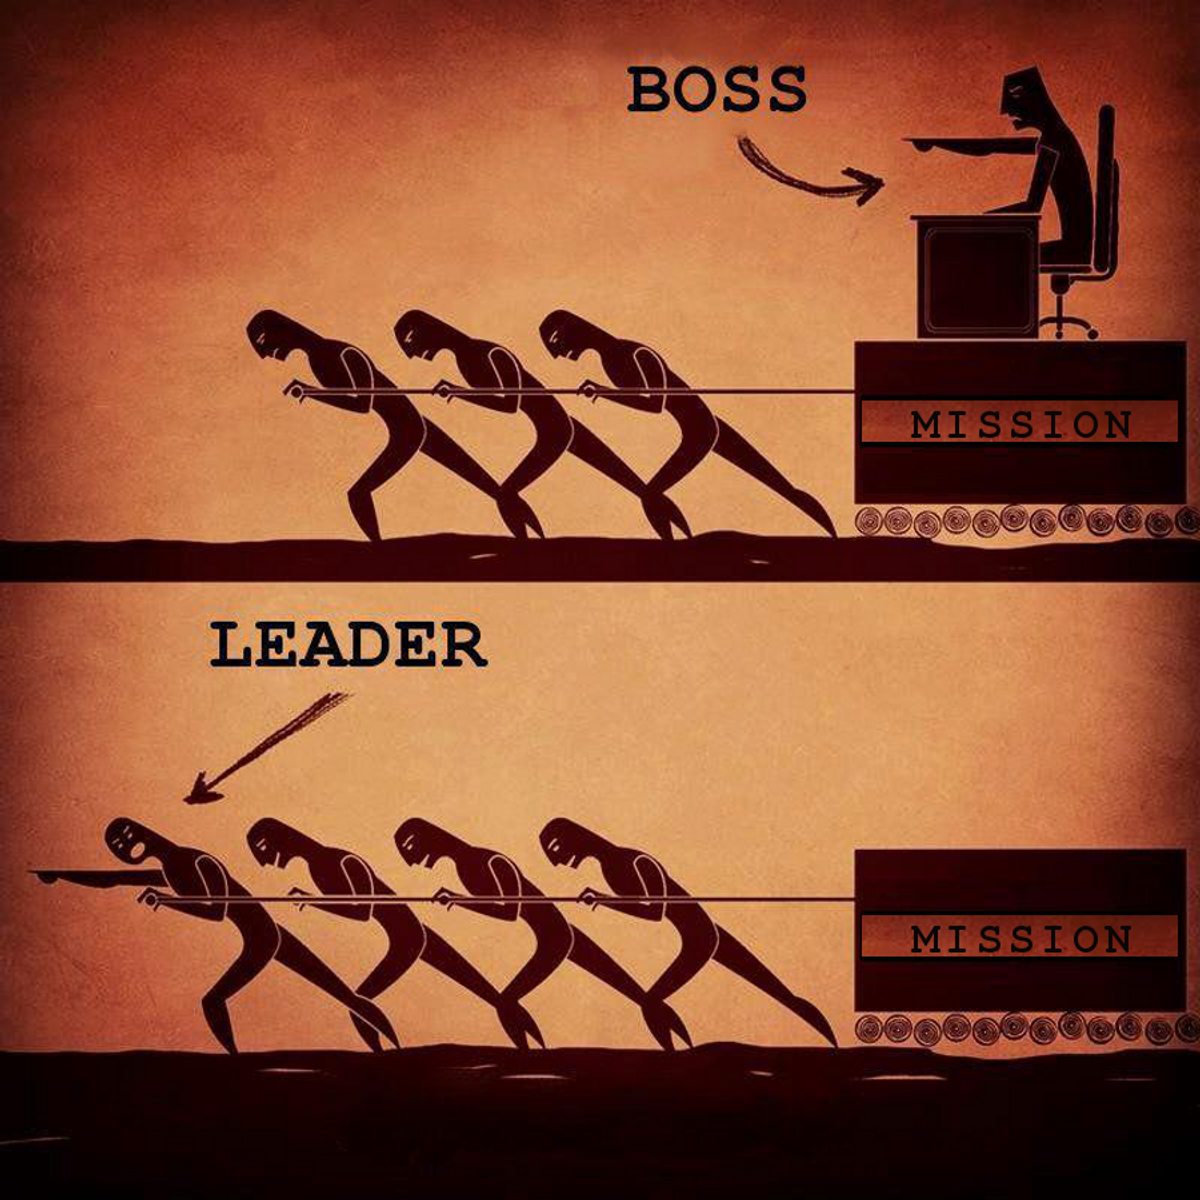 A Leader Vs A Boss